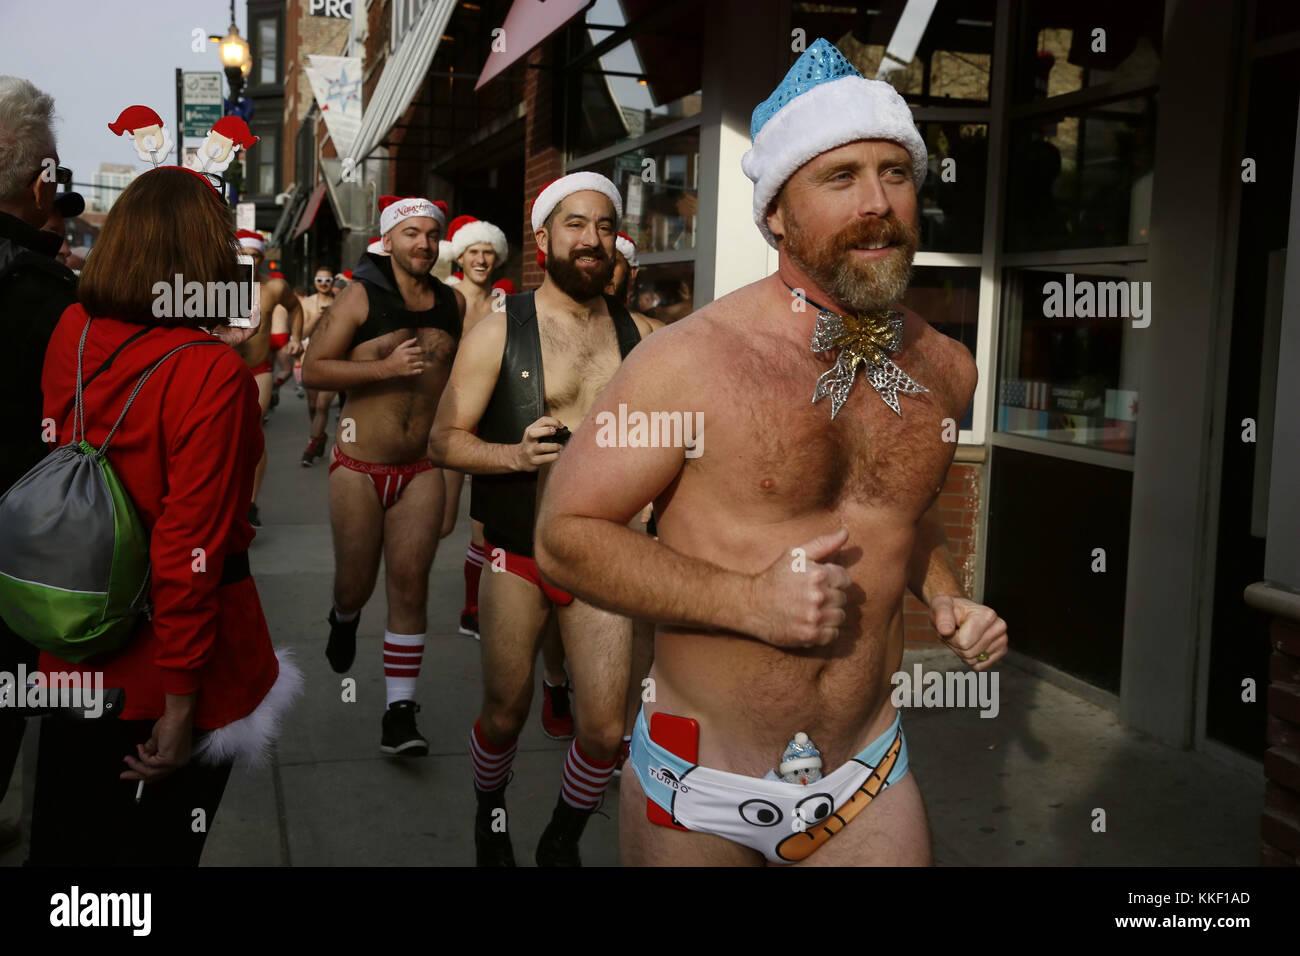 Chicago, USA. 2nd Dec, 2017. Participants wearing Santa Claus hats take part in the 2017 Chicago Santa Speedo Run Stock Photo